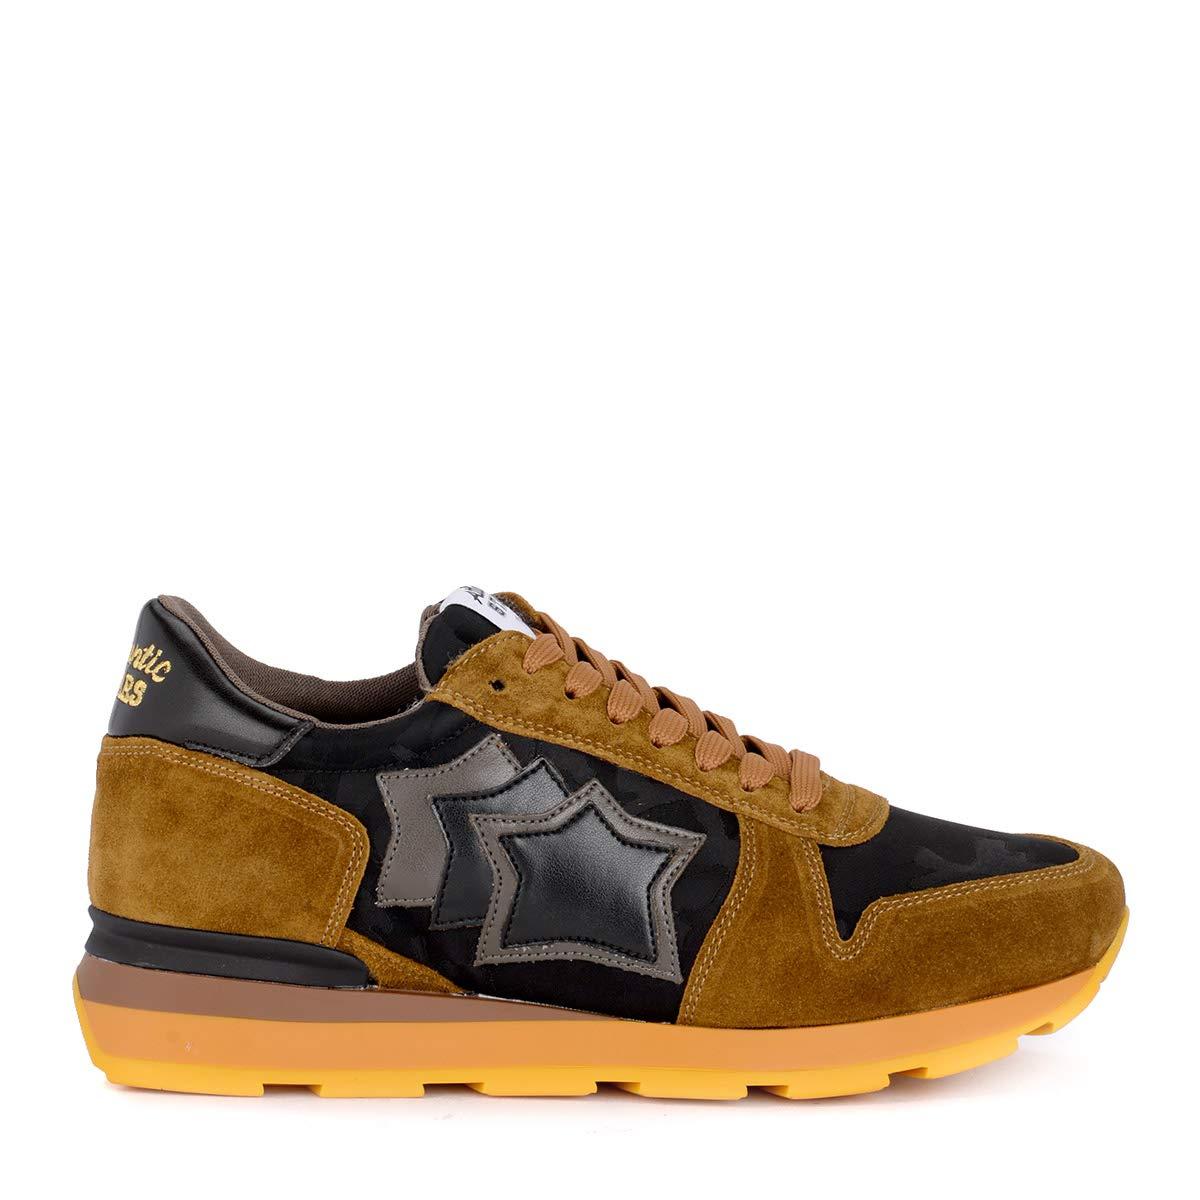 Heiß Herren Schuhe Nike Air Max 360 Gr. 45 UK 10 US 11